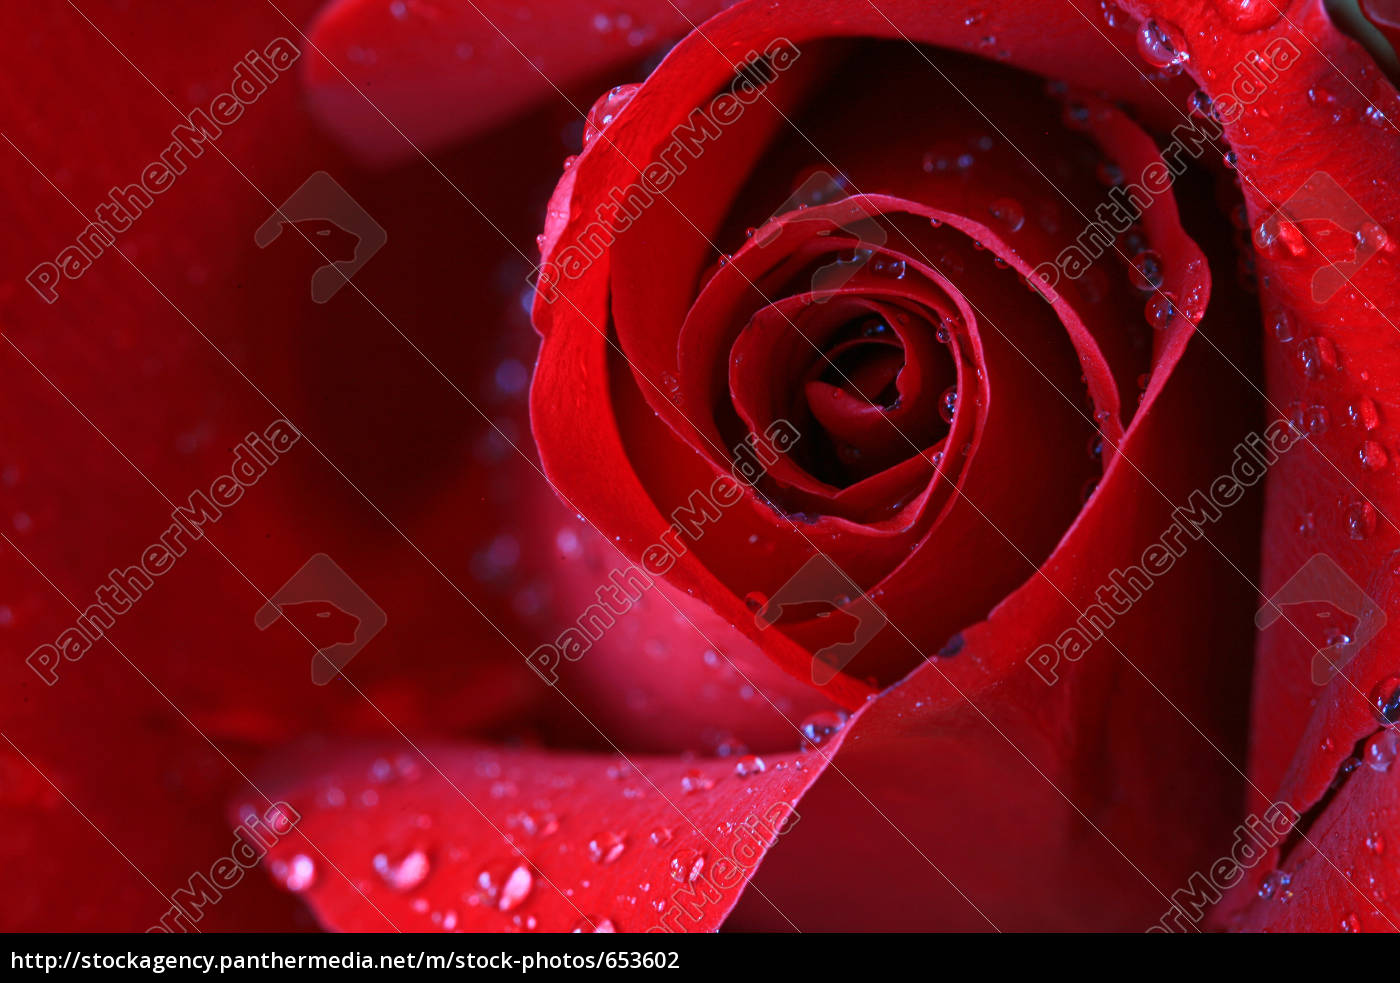 rose, red - 653602